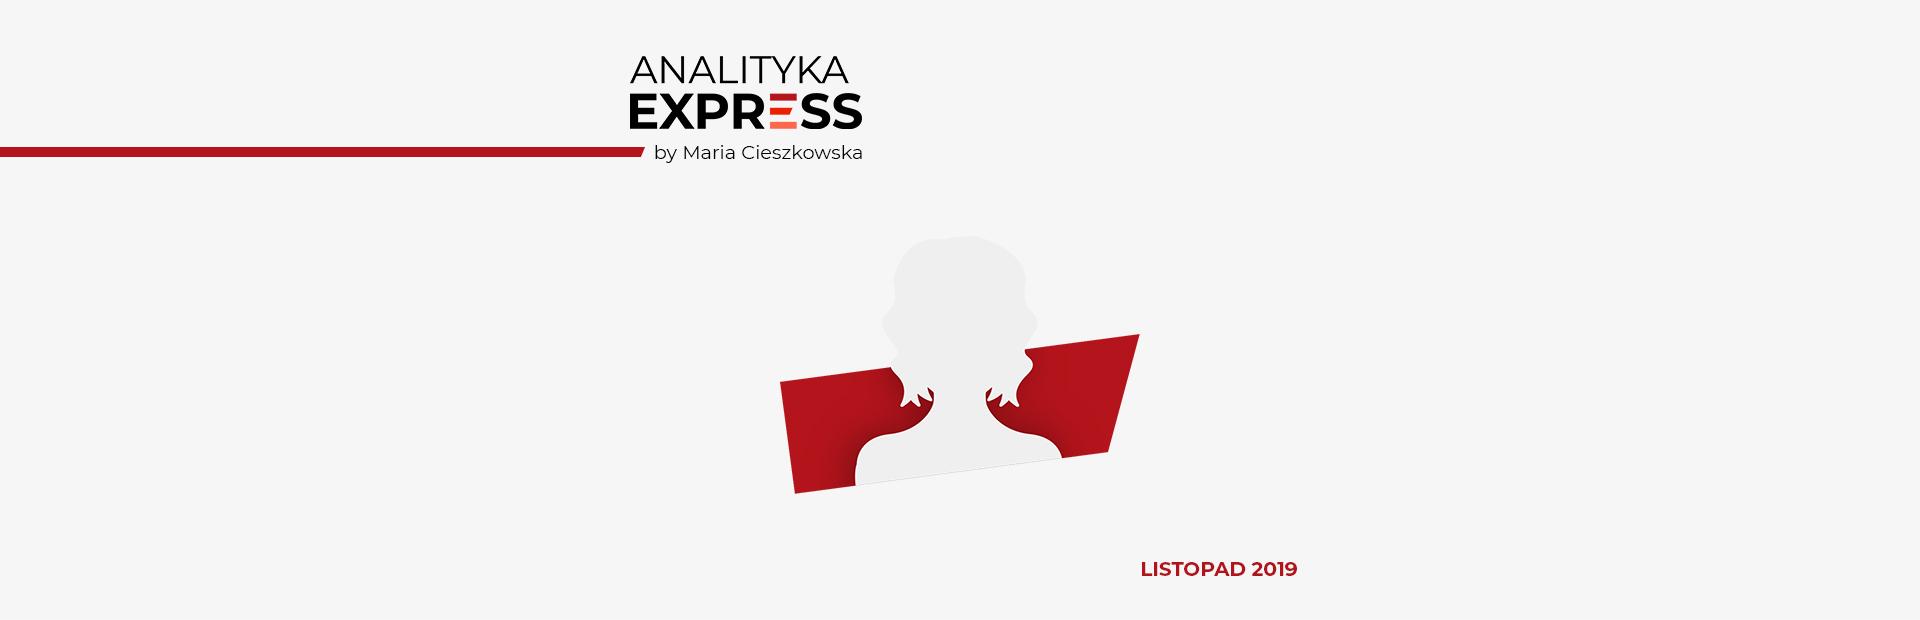 Analityka Express 11/2019